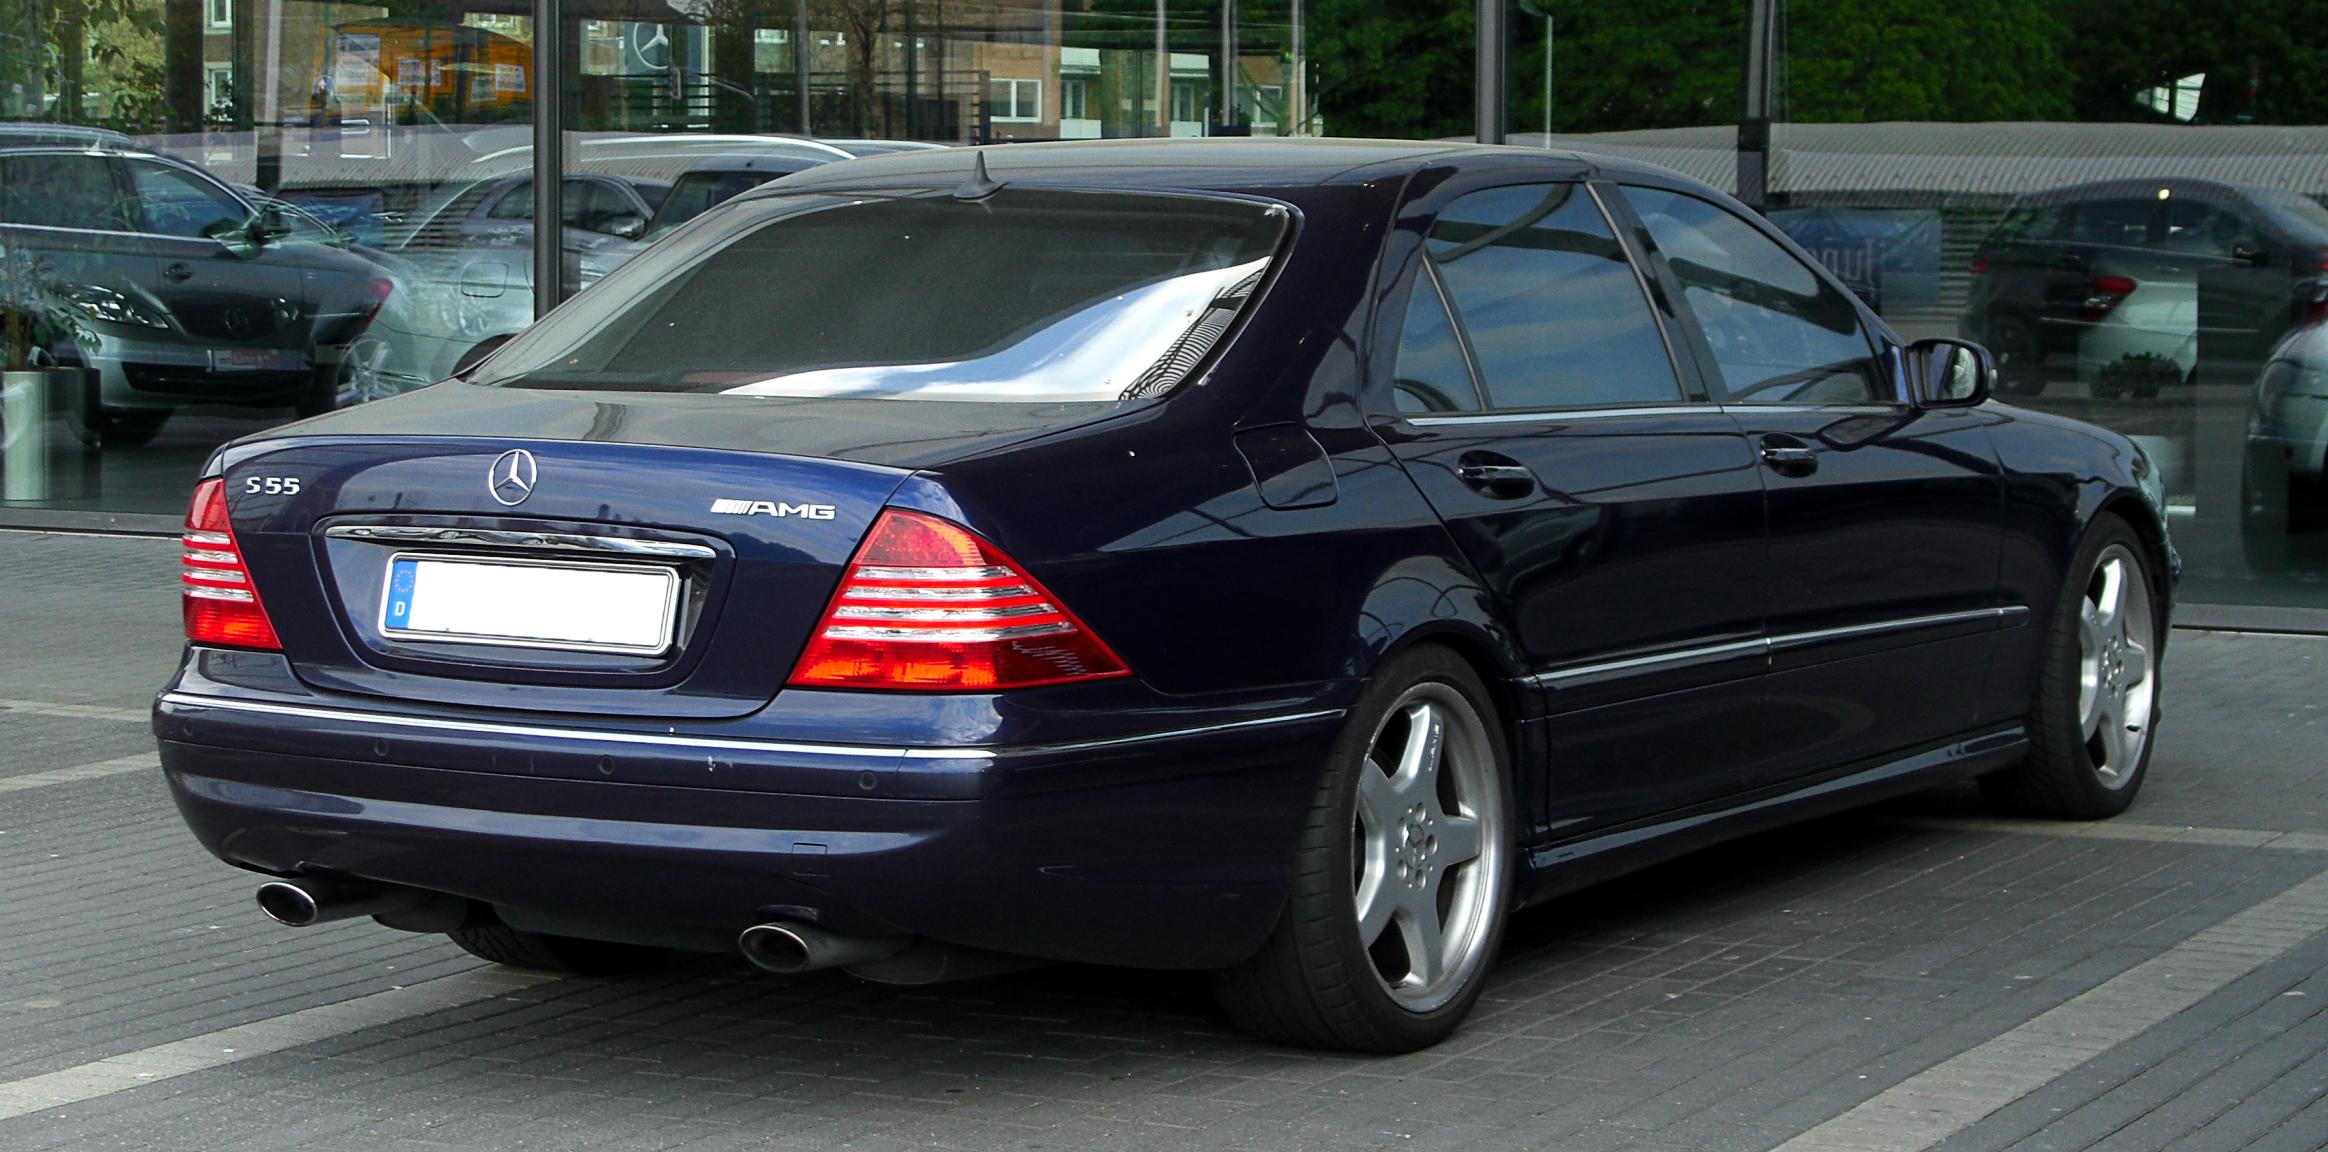 Mercedes-Benz S-klasse AMG I (W220) 1999 - 2002 Sedan #4